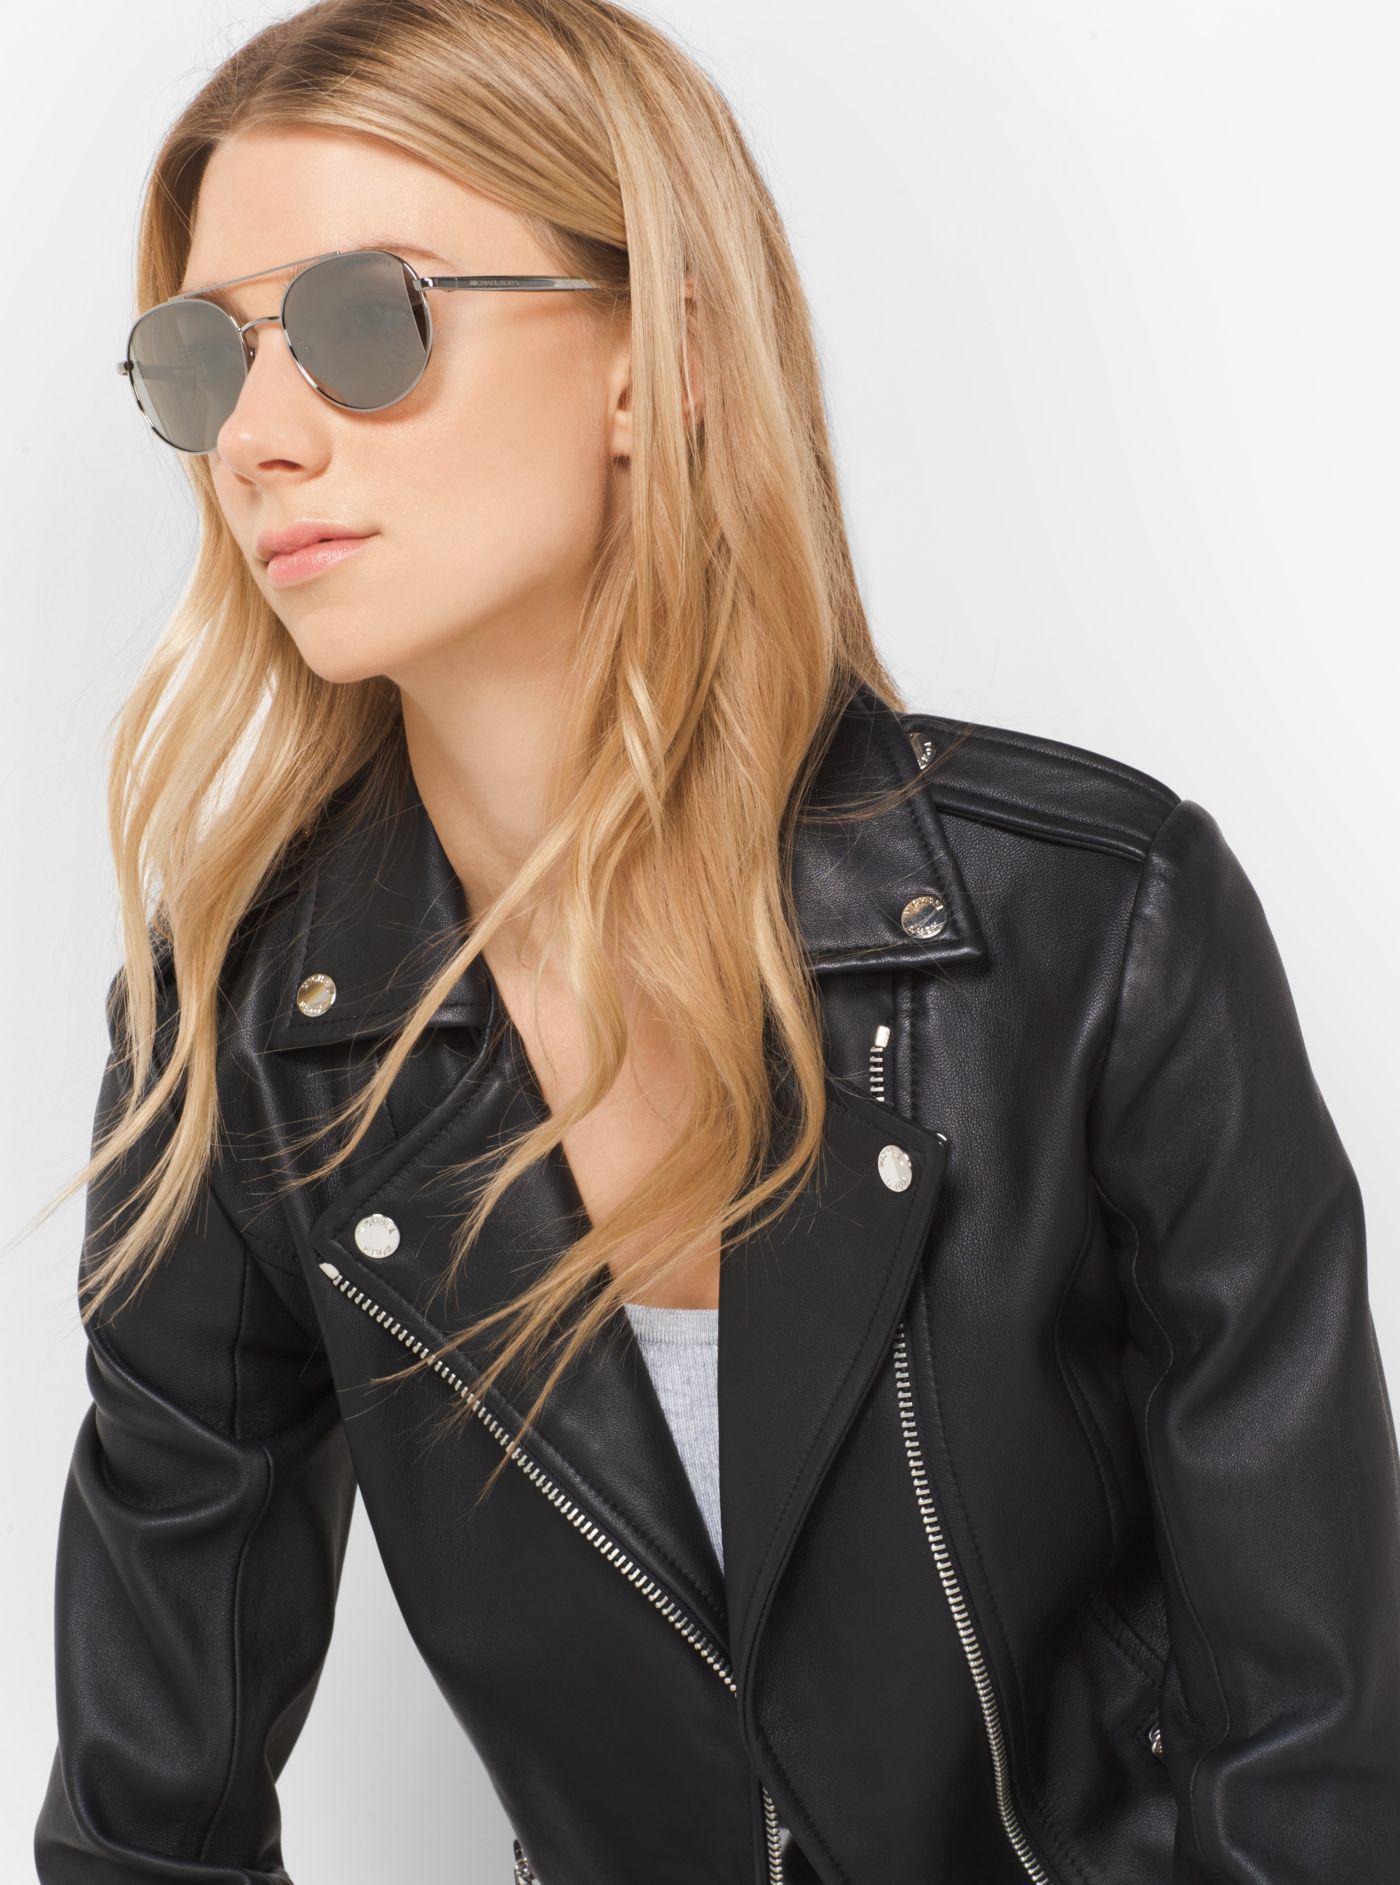 b878e5a4c Michael Kors Lon Rounded Aviator Sunglasses in Gray - Lyst